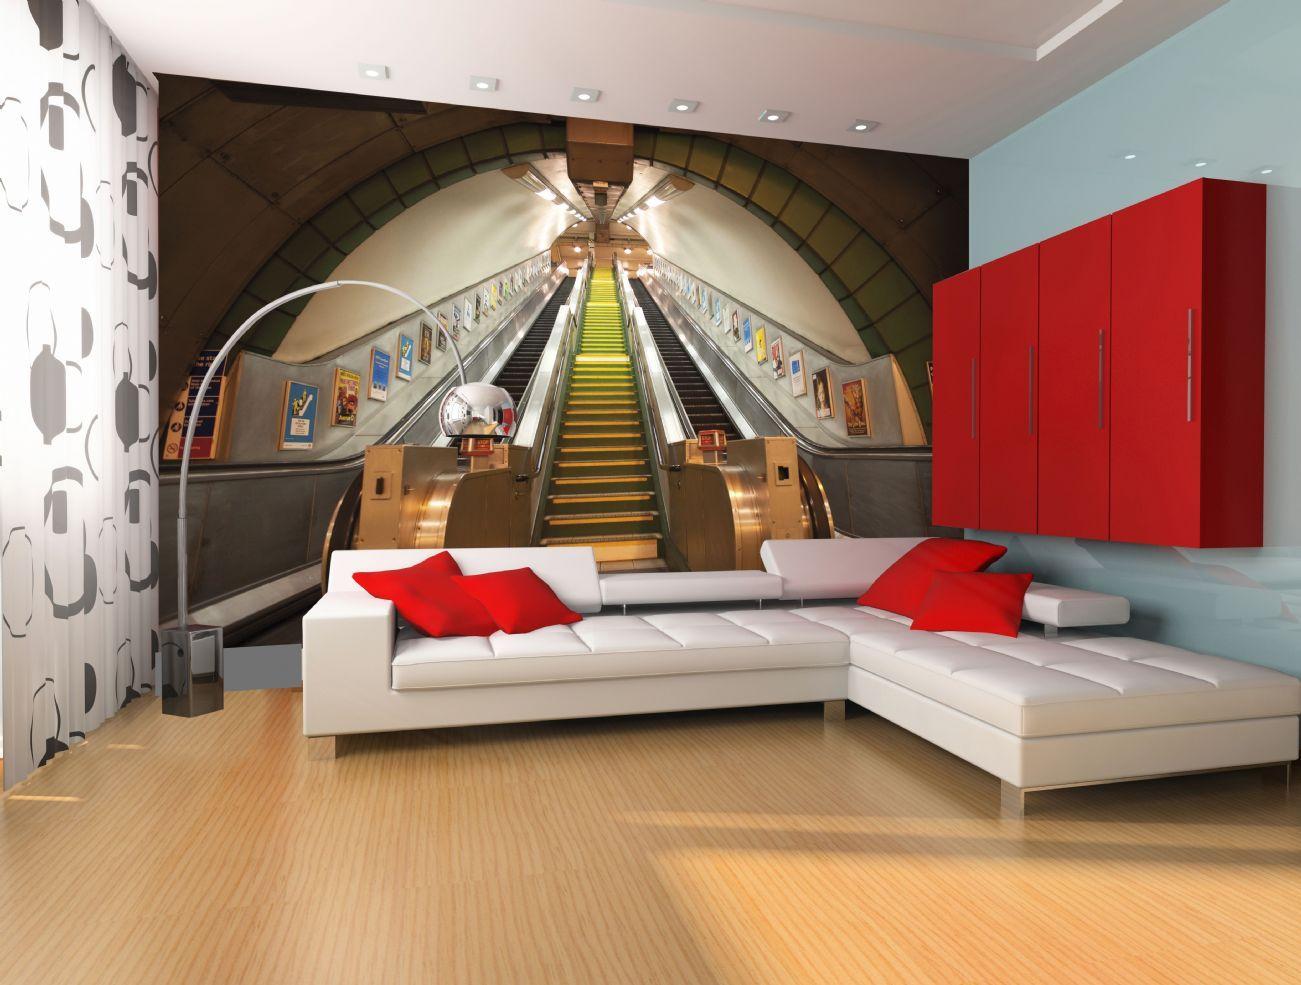 london wallpaper bedroom - home design